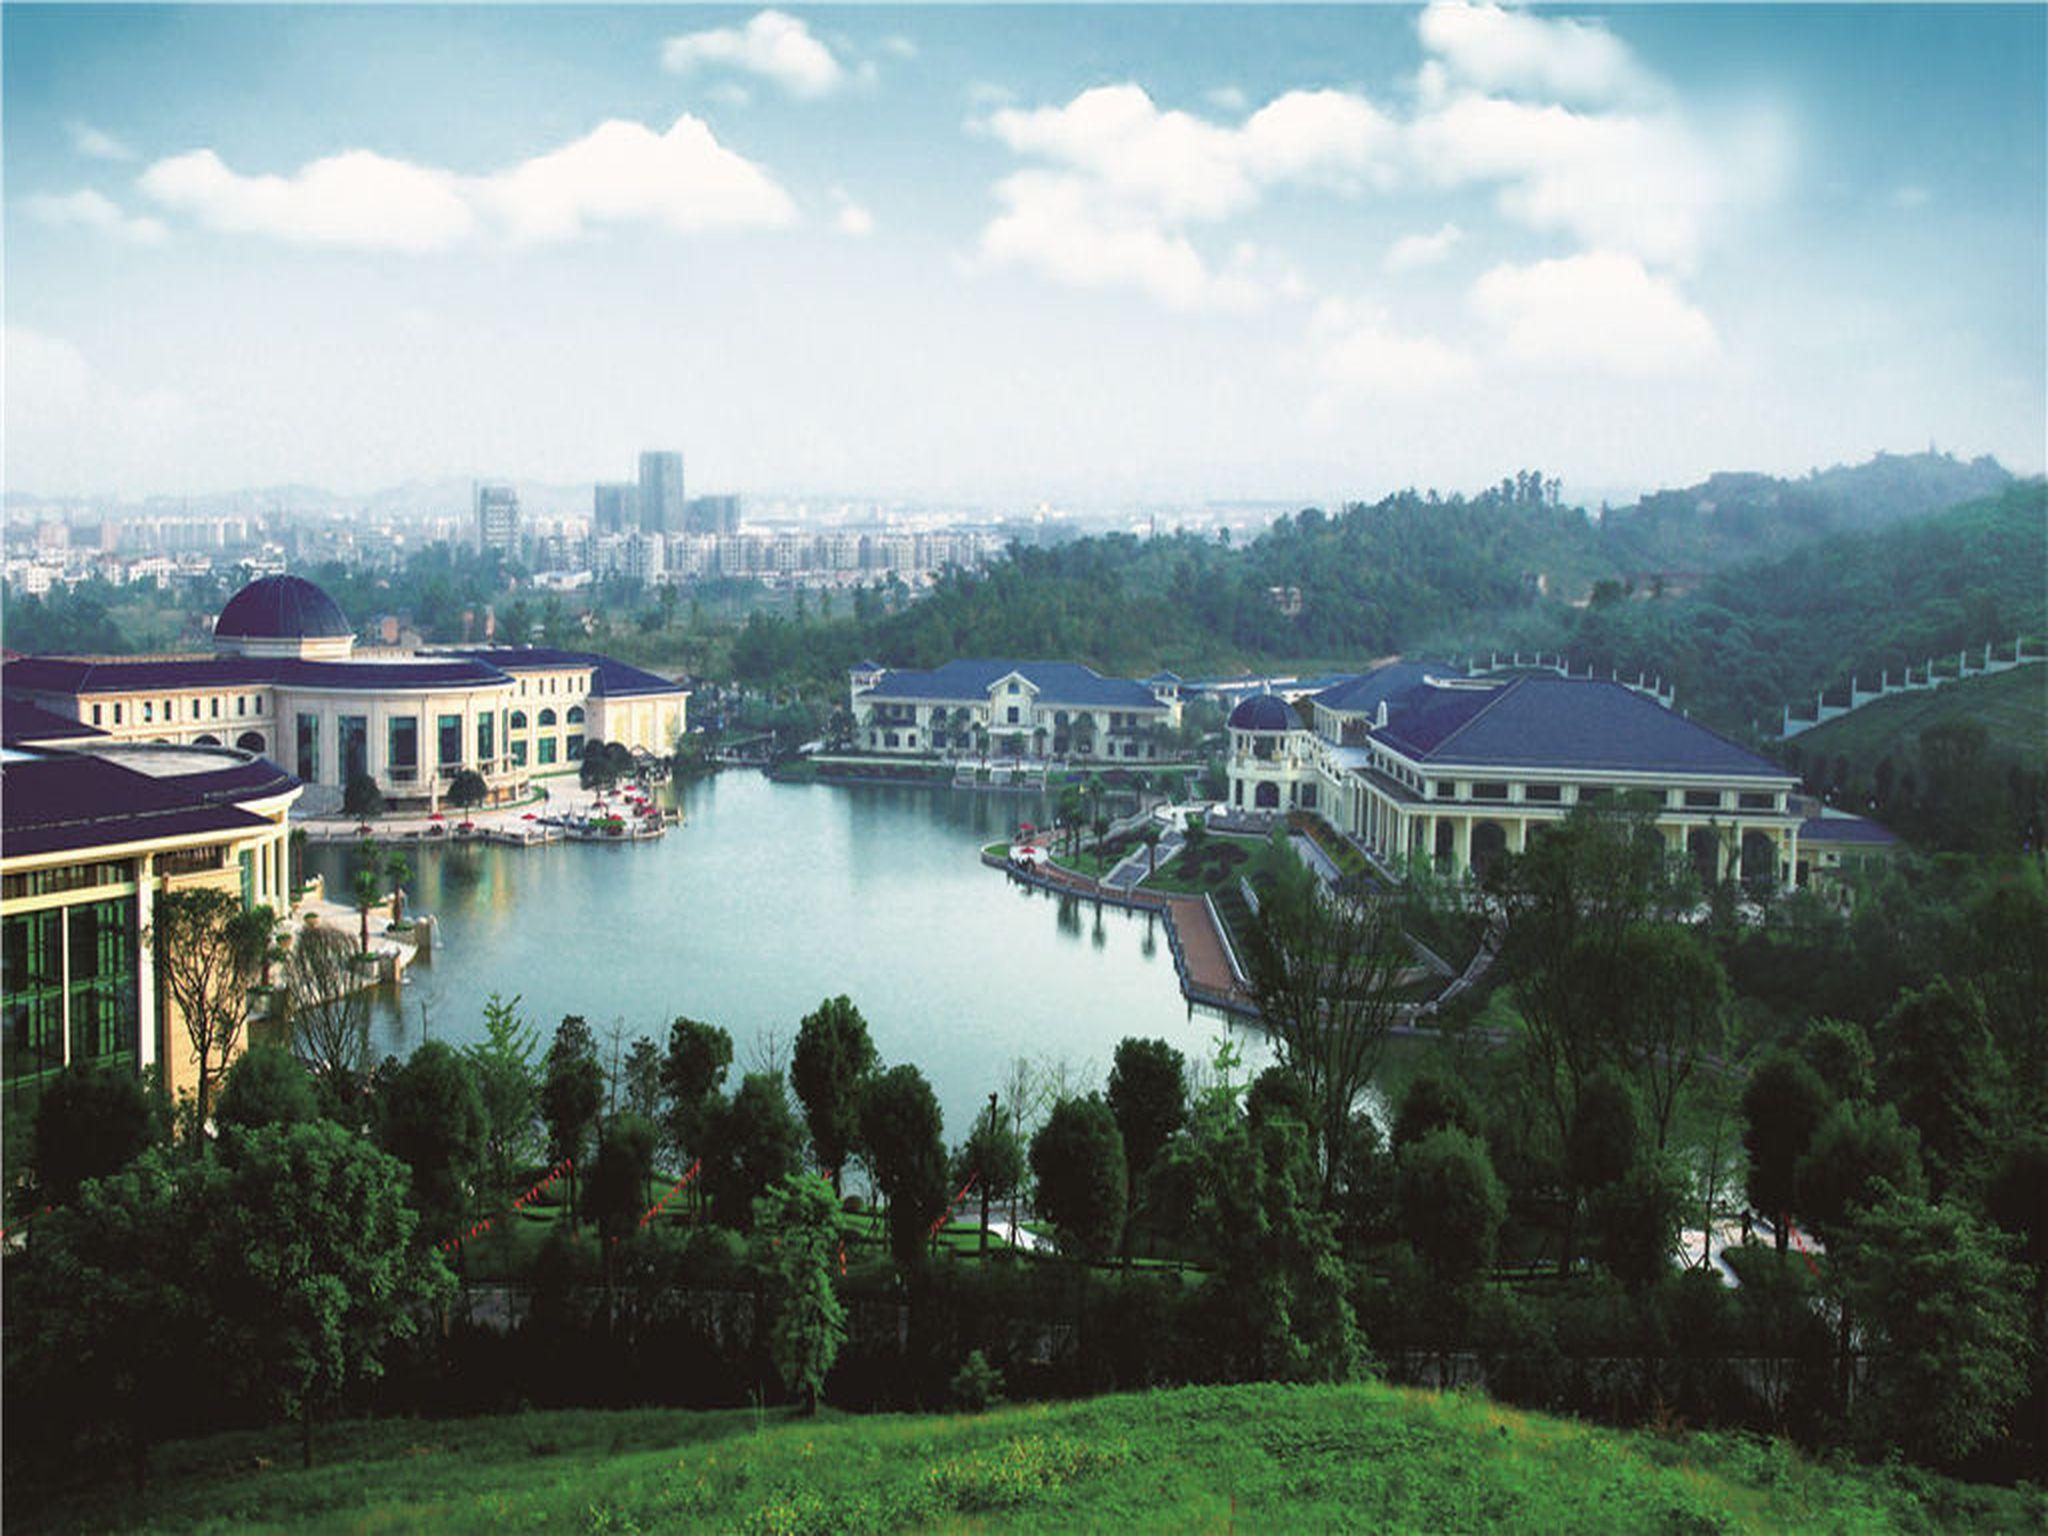 Chongqing Evergrande Hotel